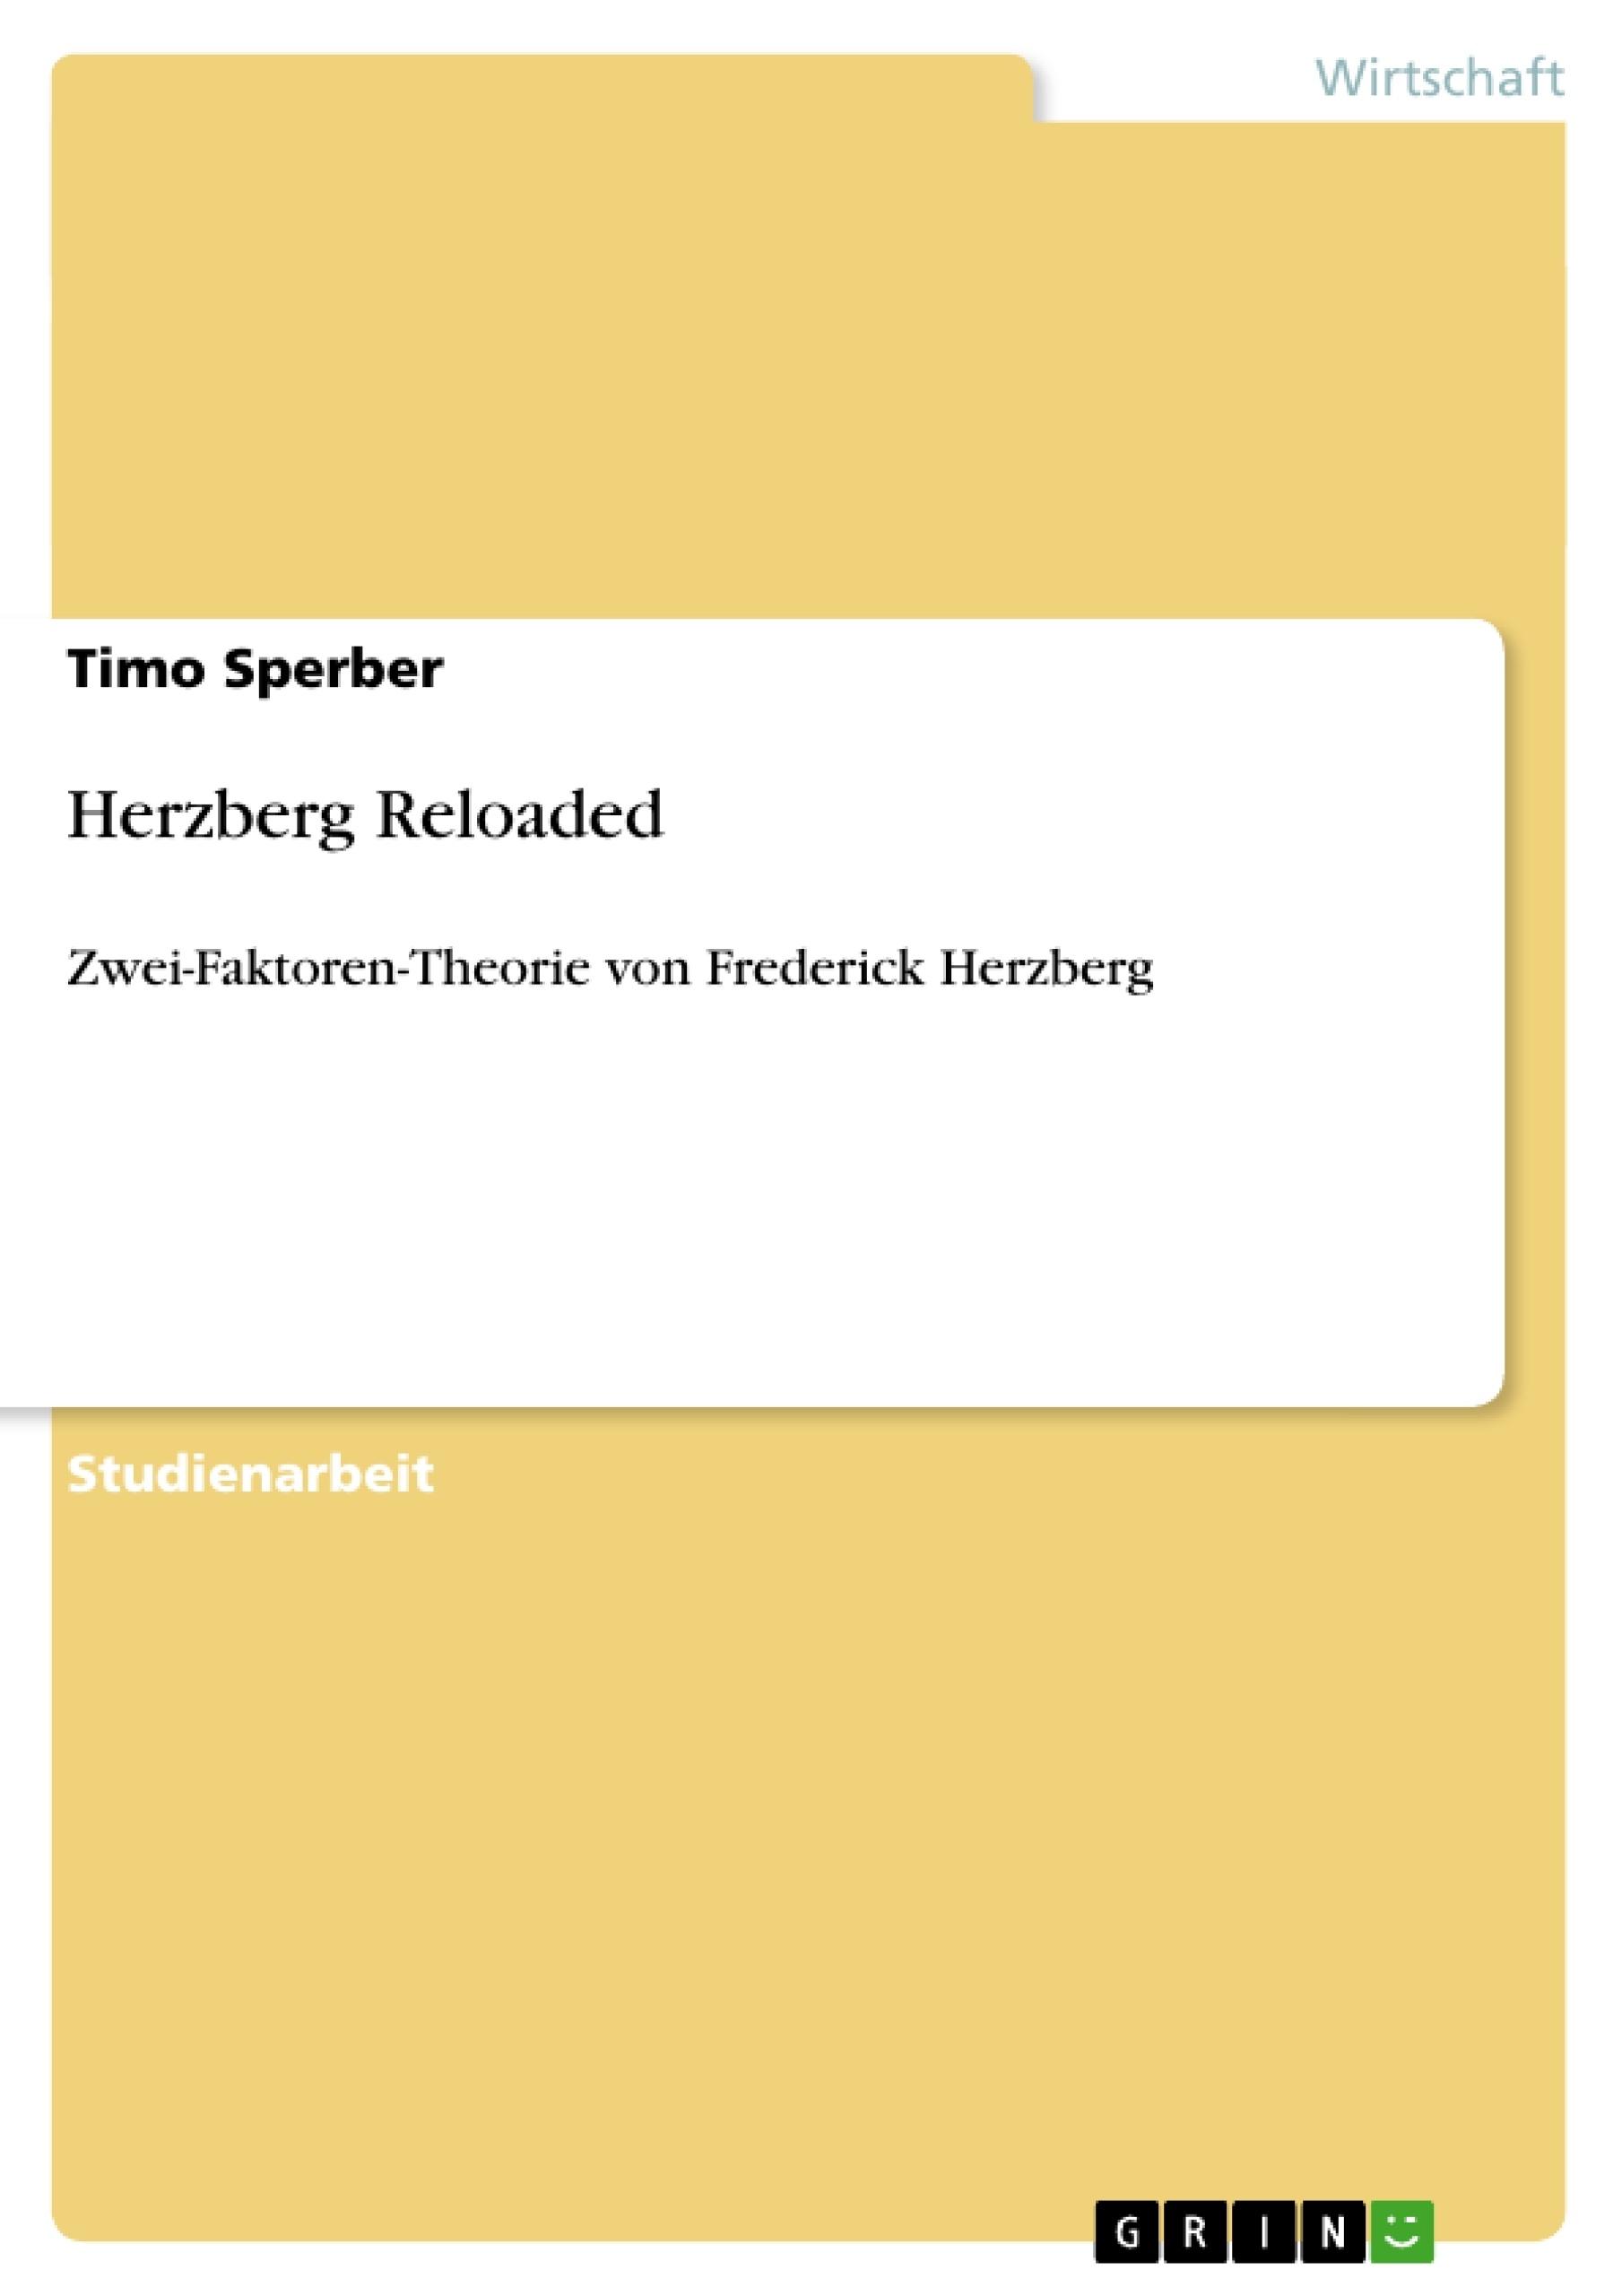 Titel: Herzberg Reloaded